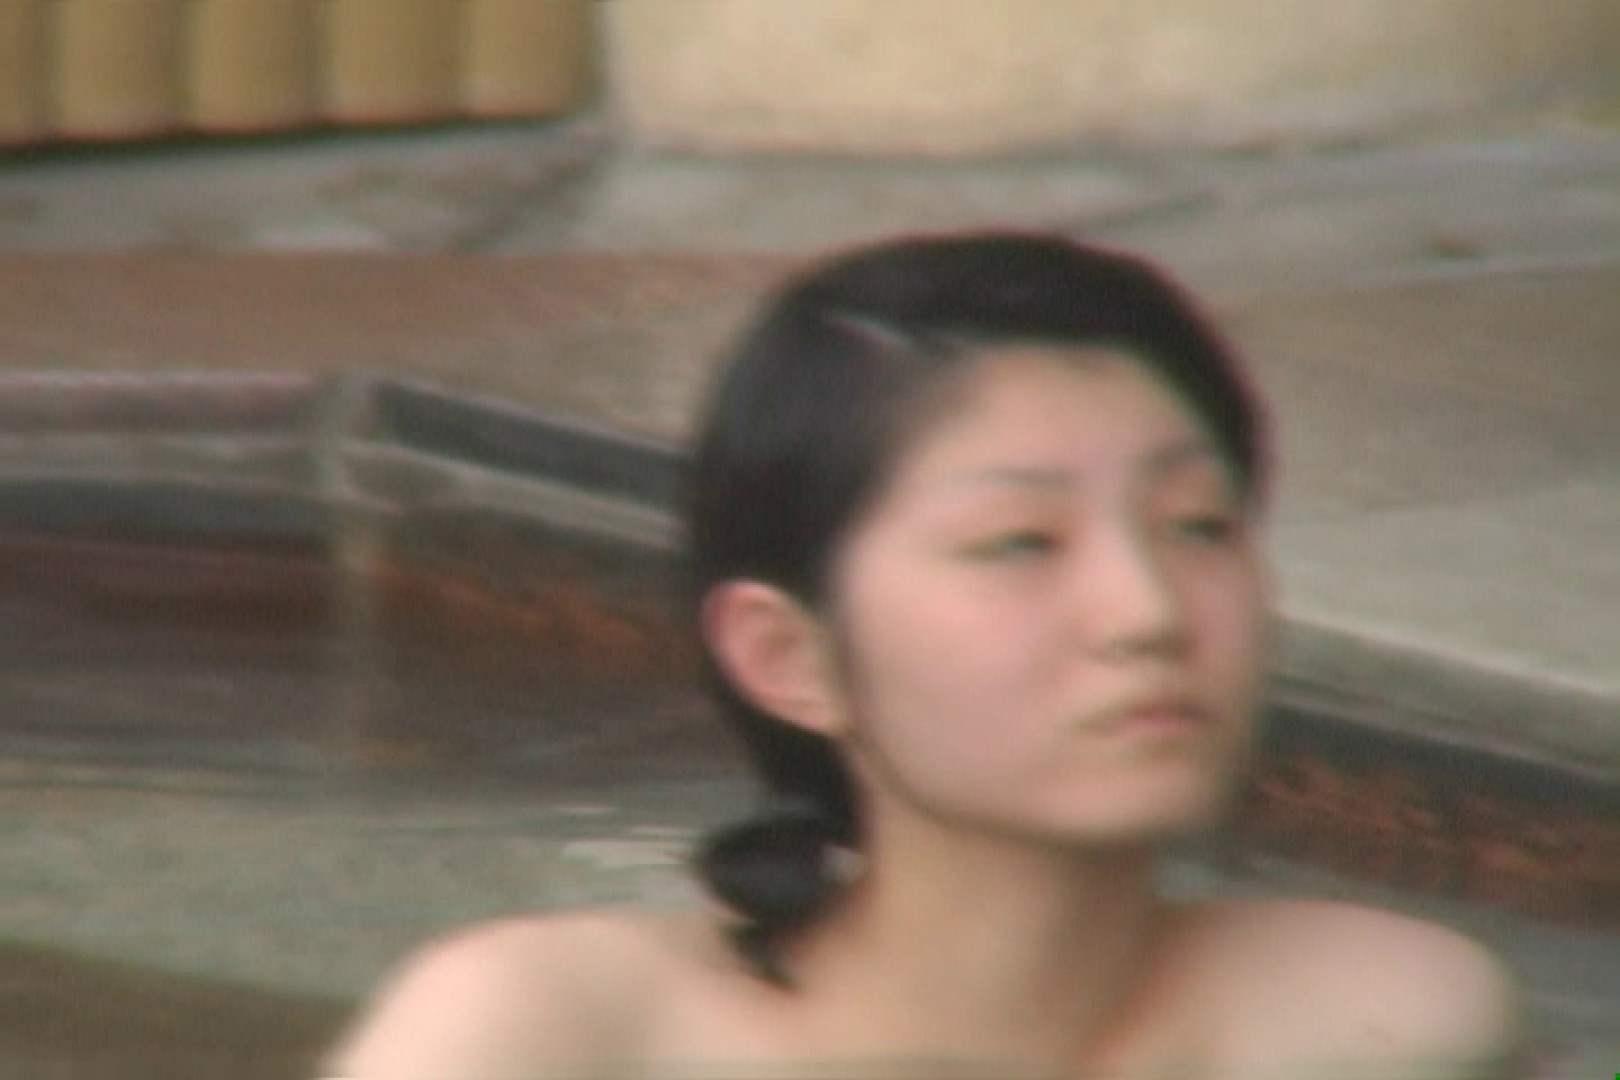 Aquaな露天風呂Vol.579 盗撮 AV無料 52画像 38